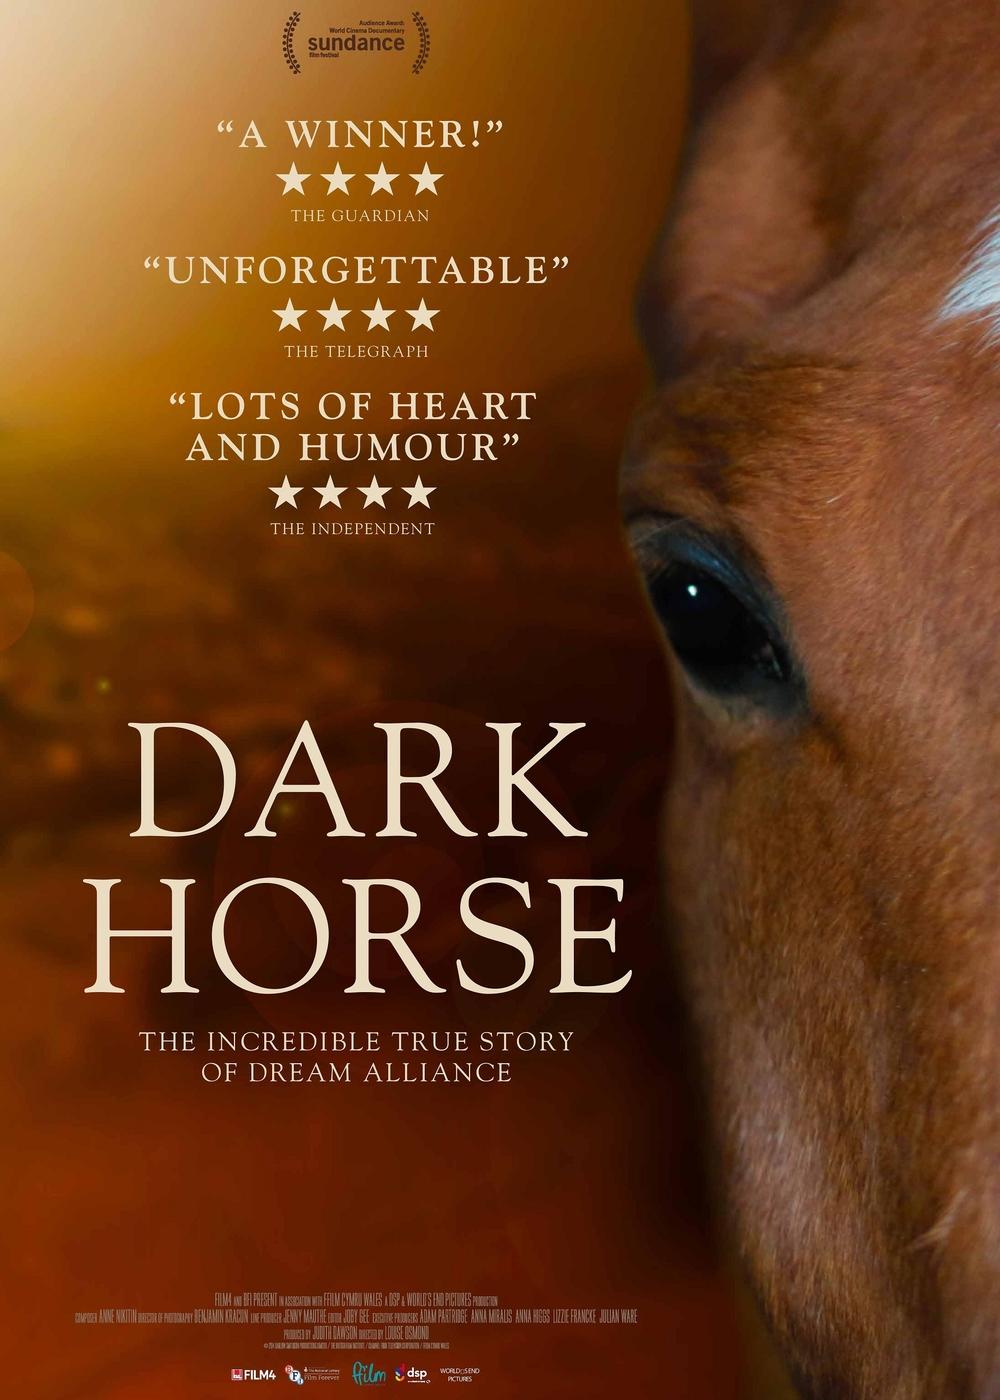 darkhorse_poster.jpg